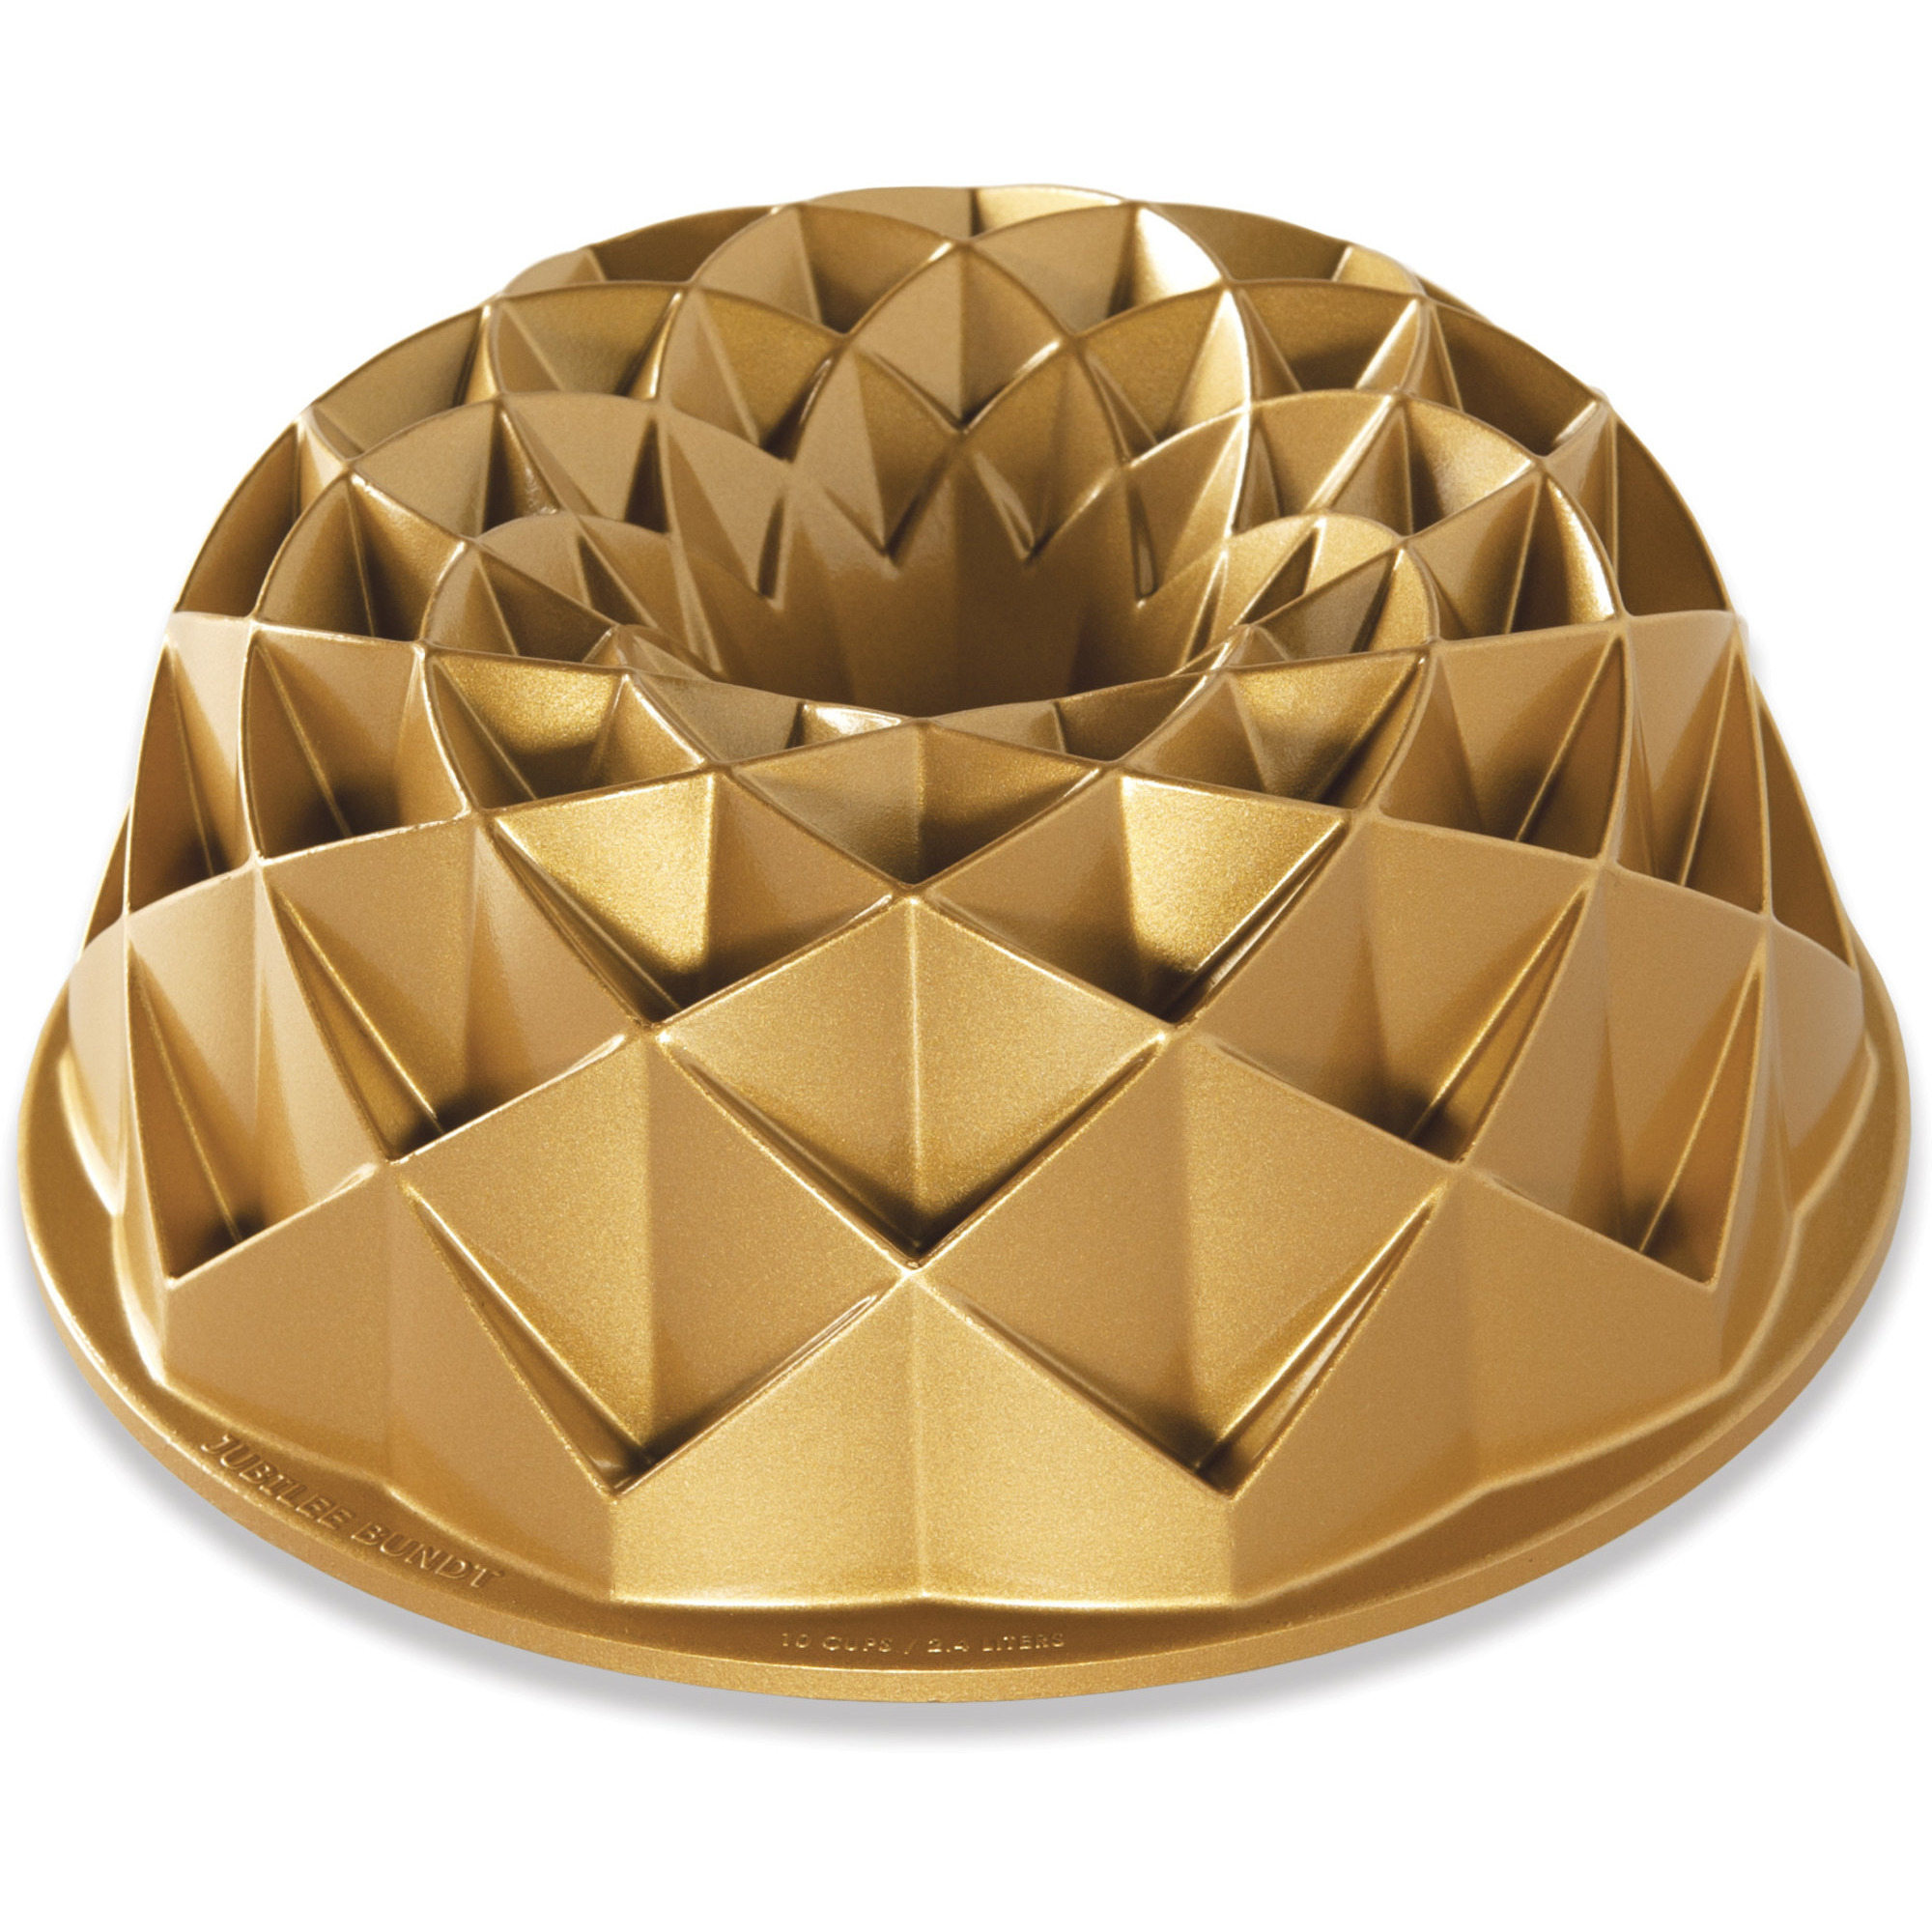 Nordic Ware Kakform Jubilee